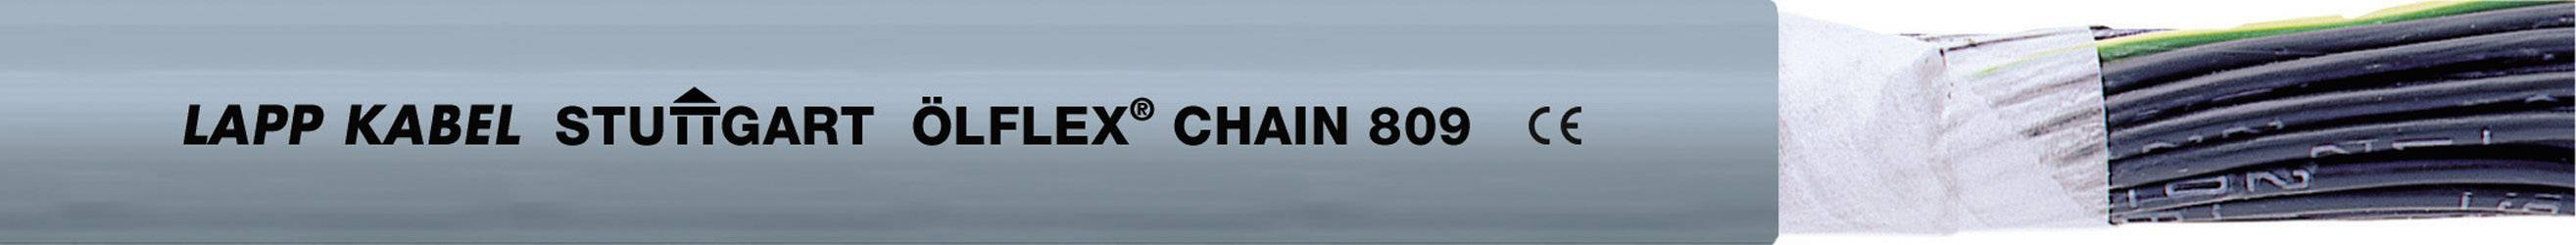 Žíla kabelu LappKabel ÖLFLEX CHAIN 809 12G1,5 (1026729), 12x 1,5 mm², PVC, Ø 12,3 mm, 100 m, šedá